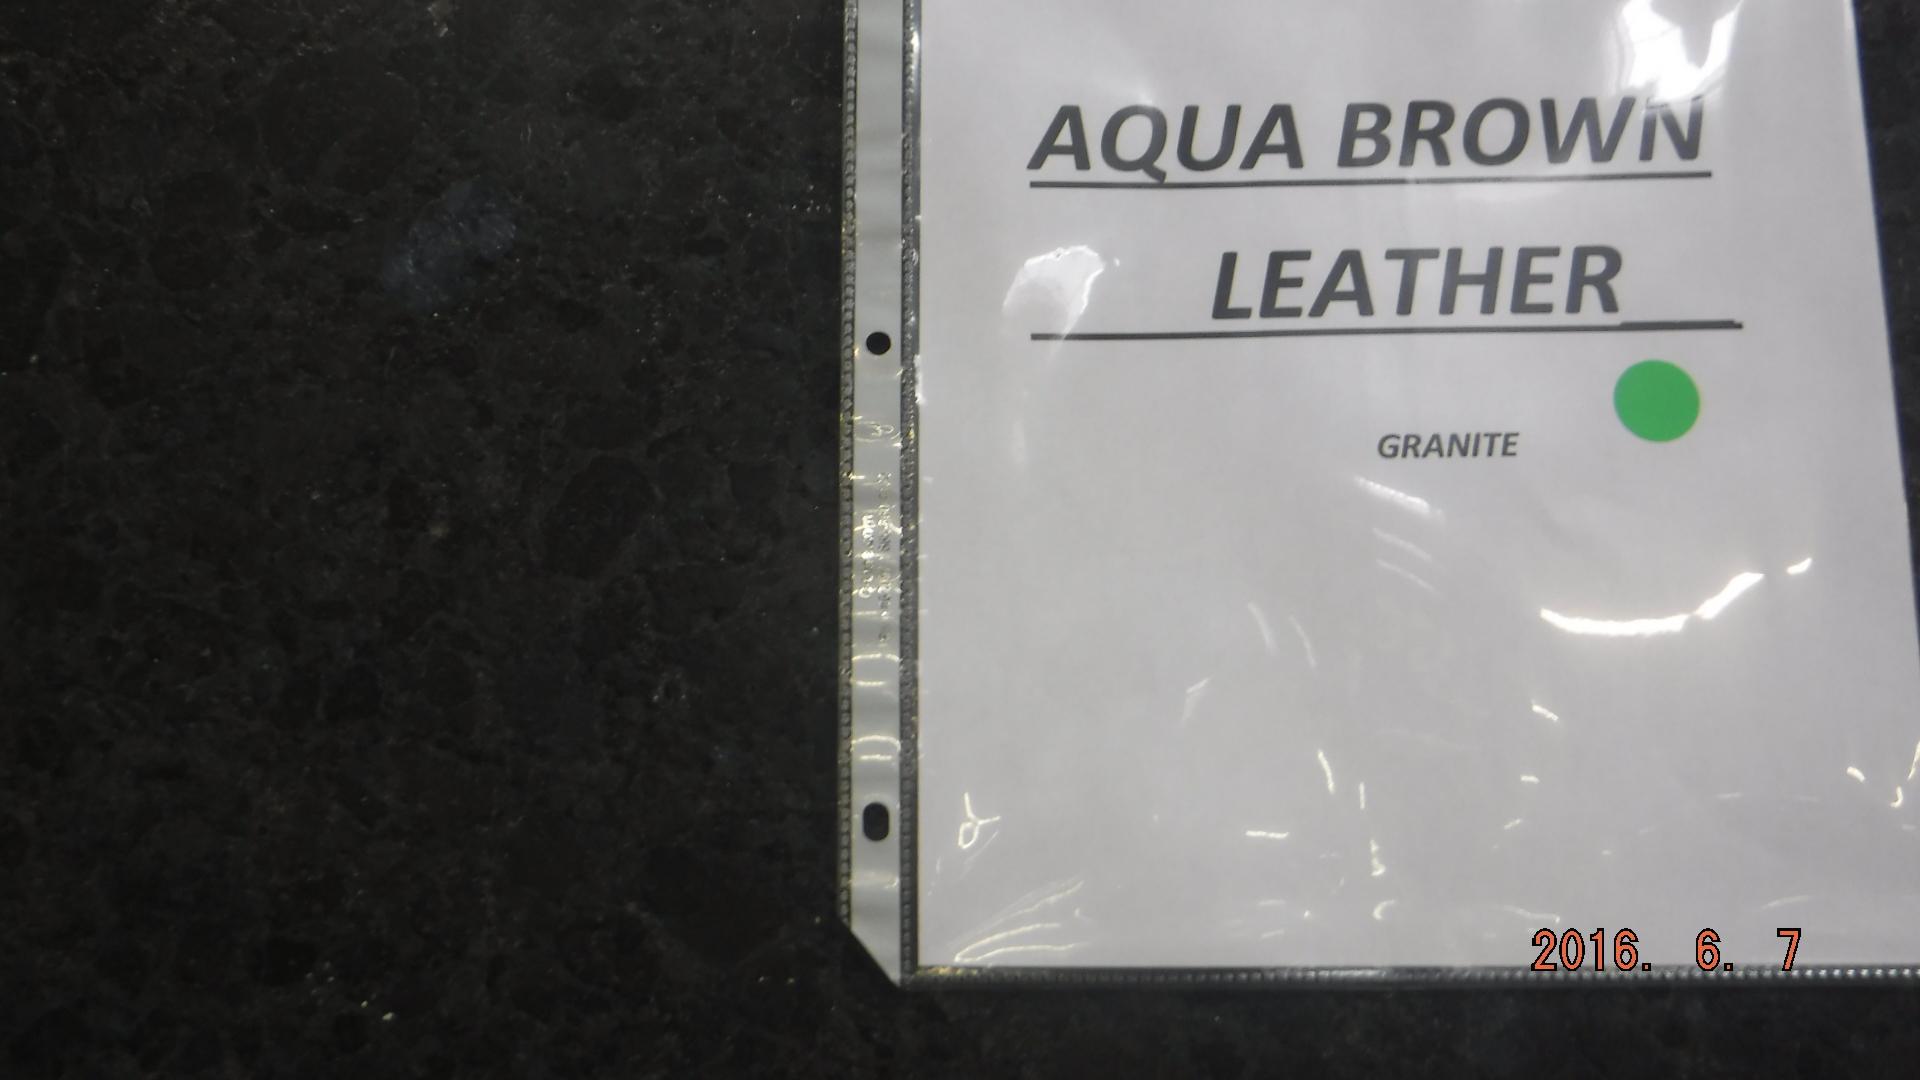 Aqua Brown LF 3CM - Nashville, TN